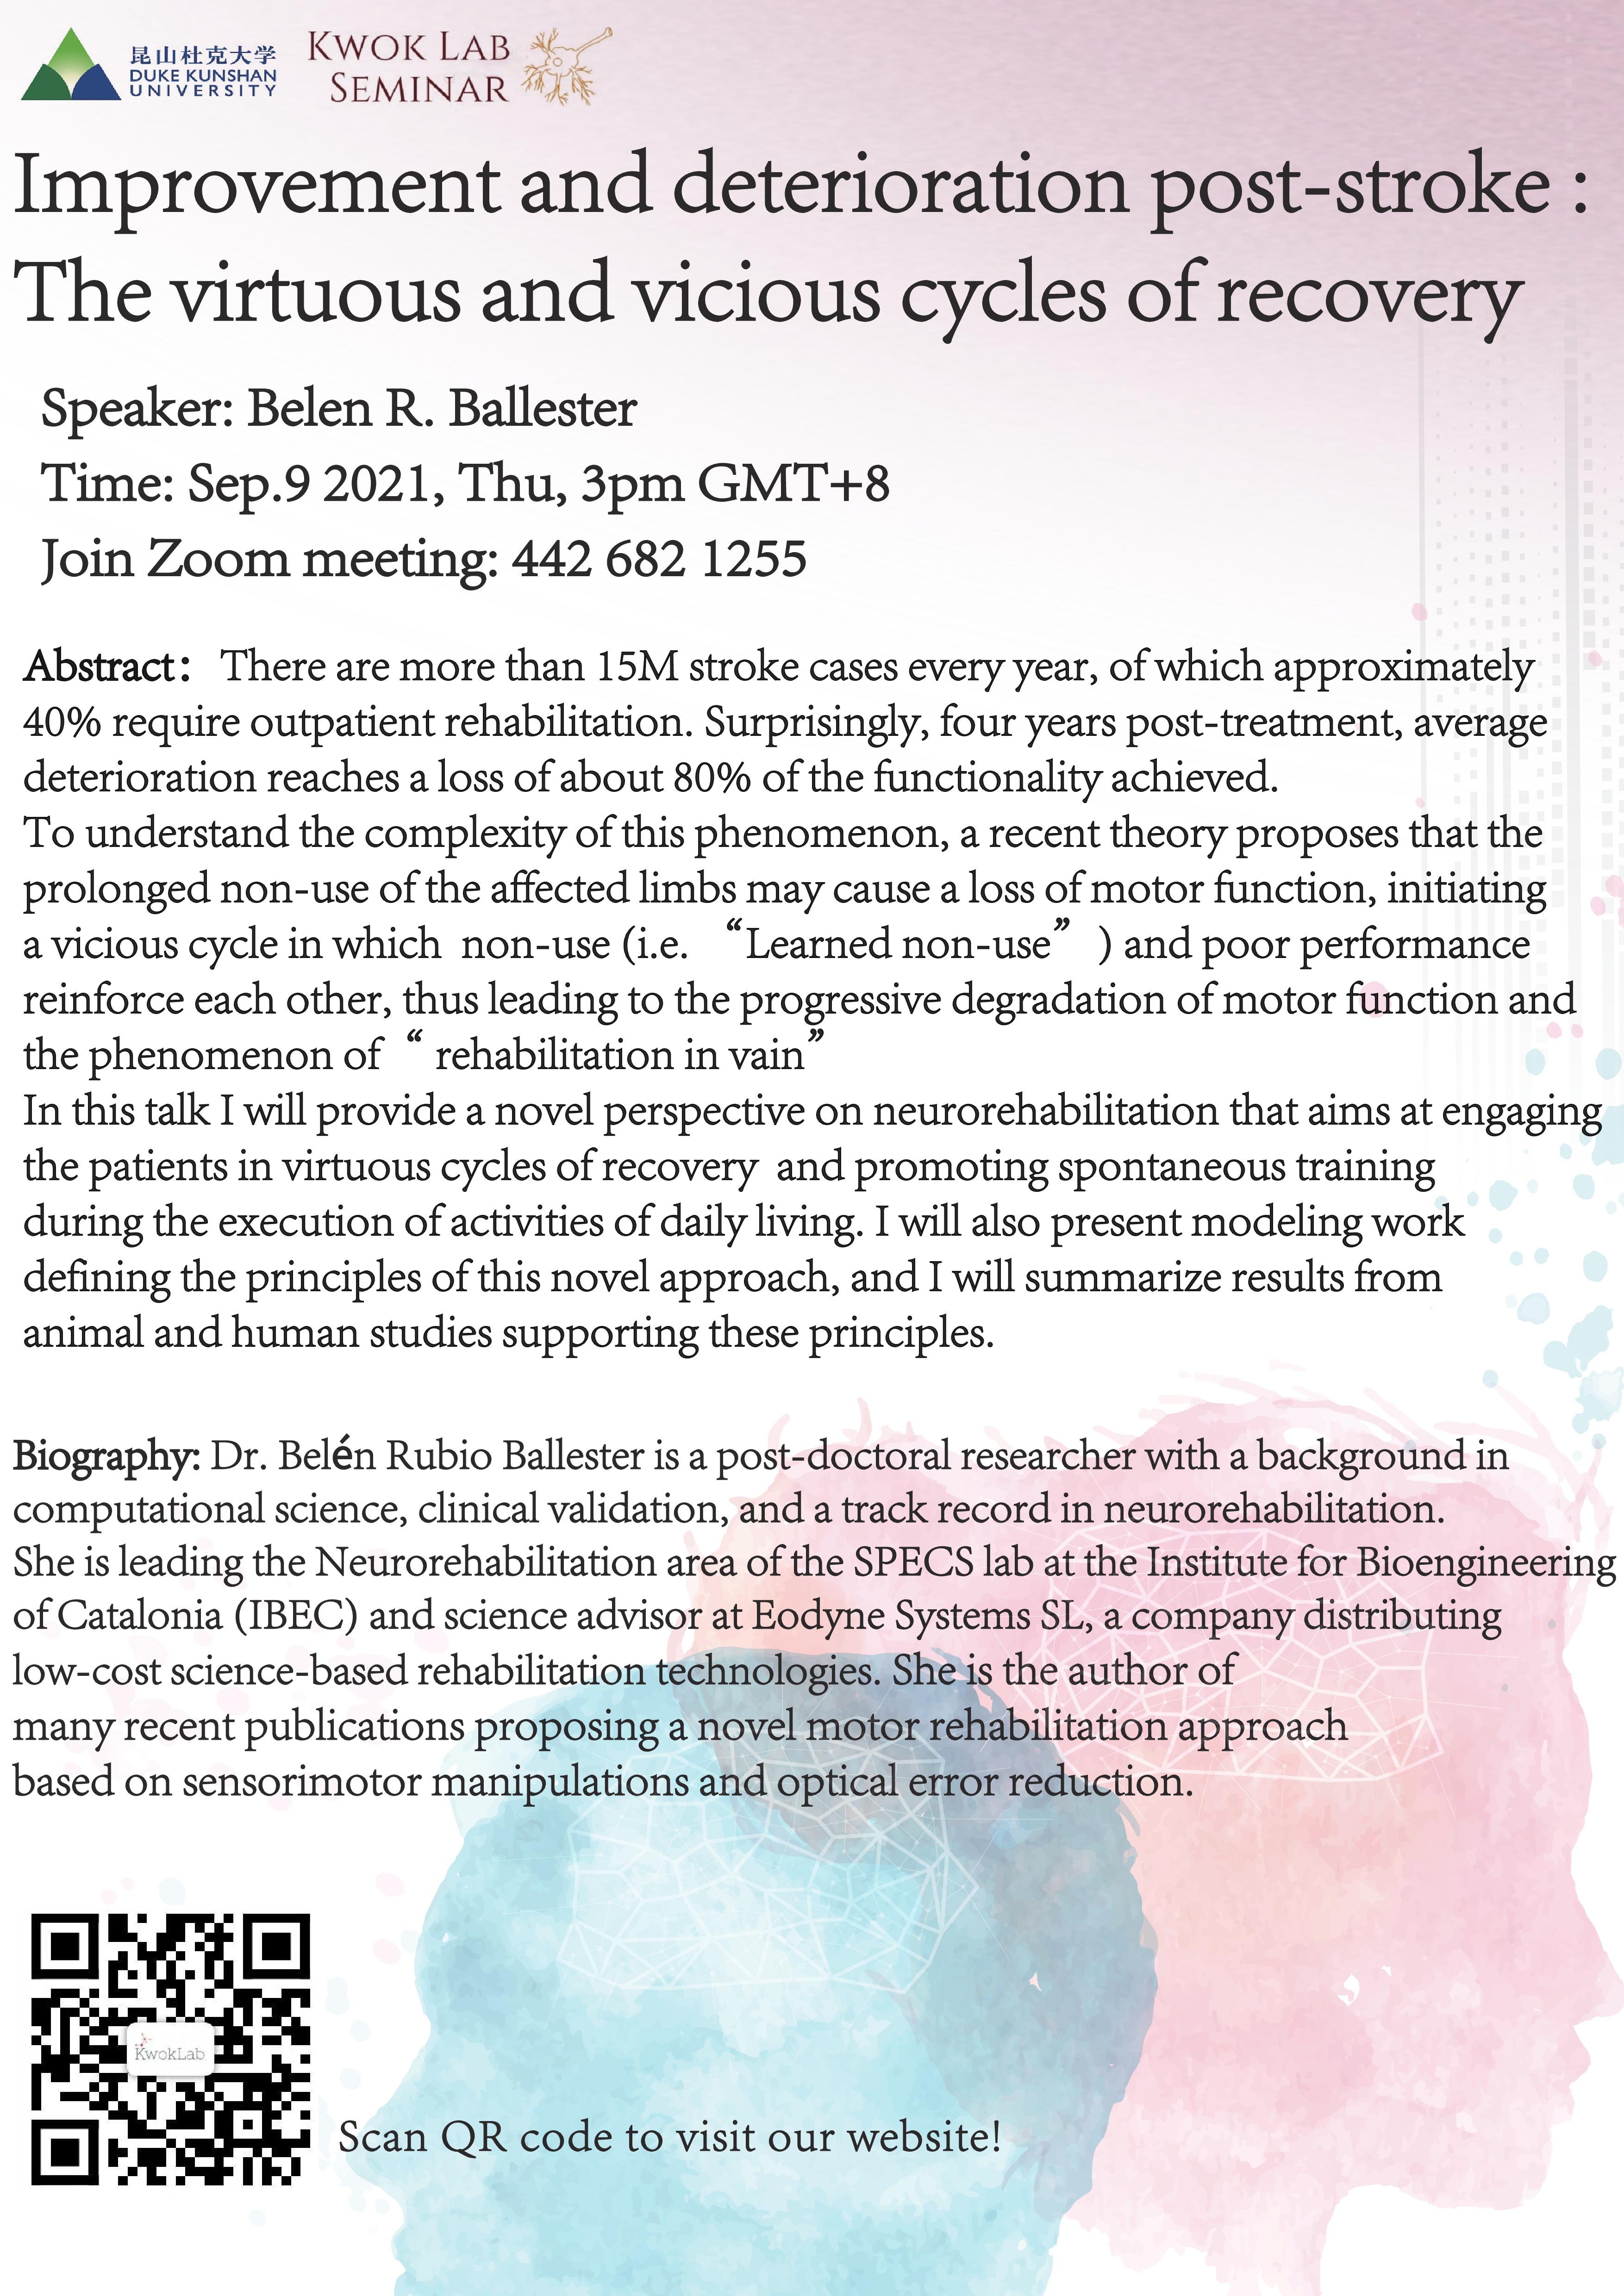 Seminar_Poster_20210909